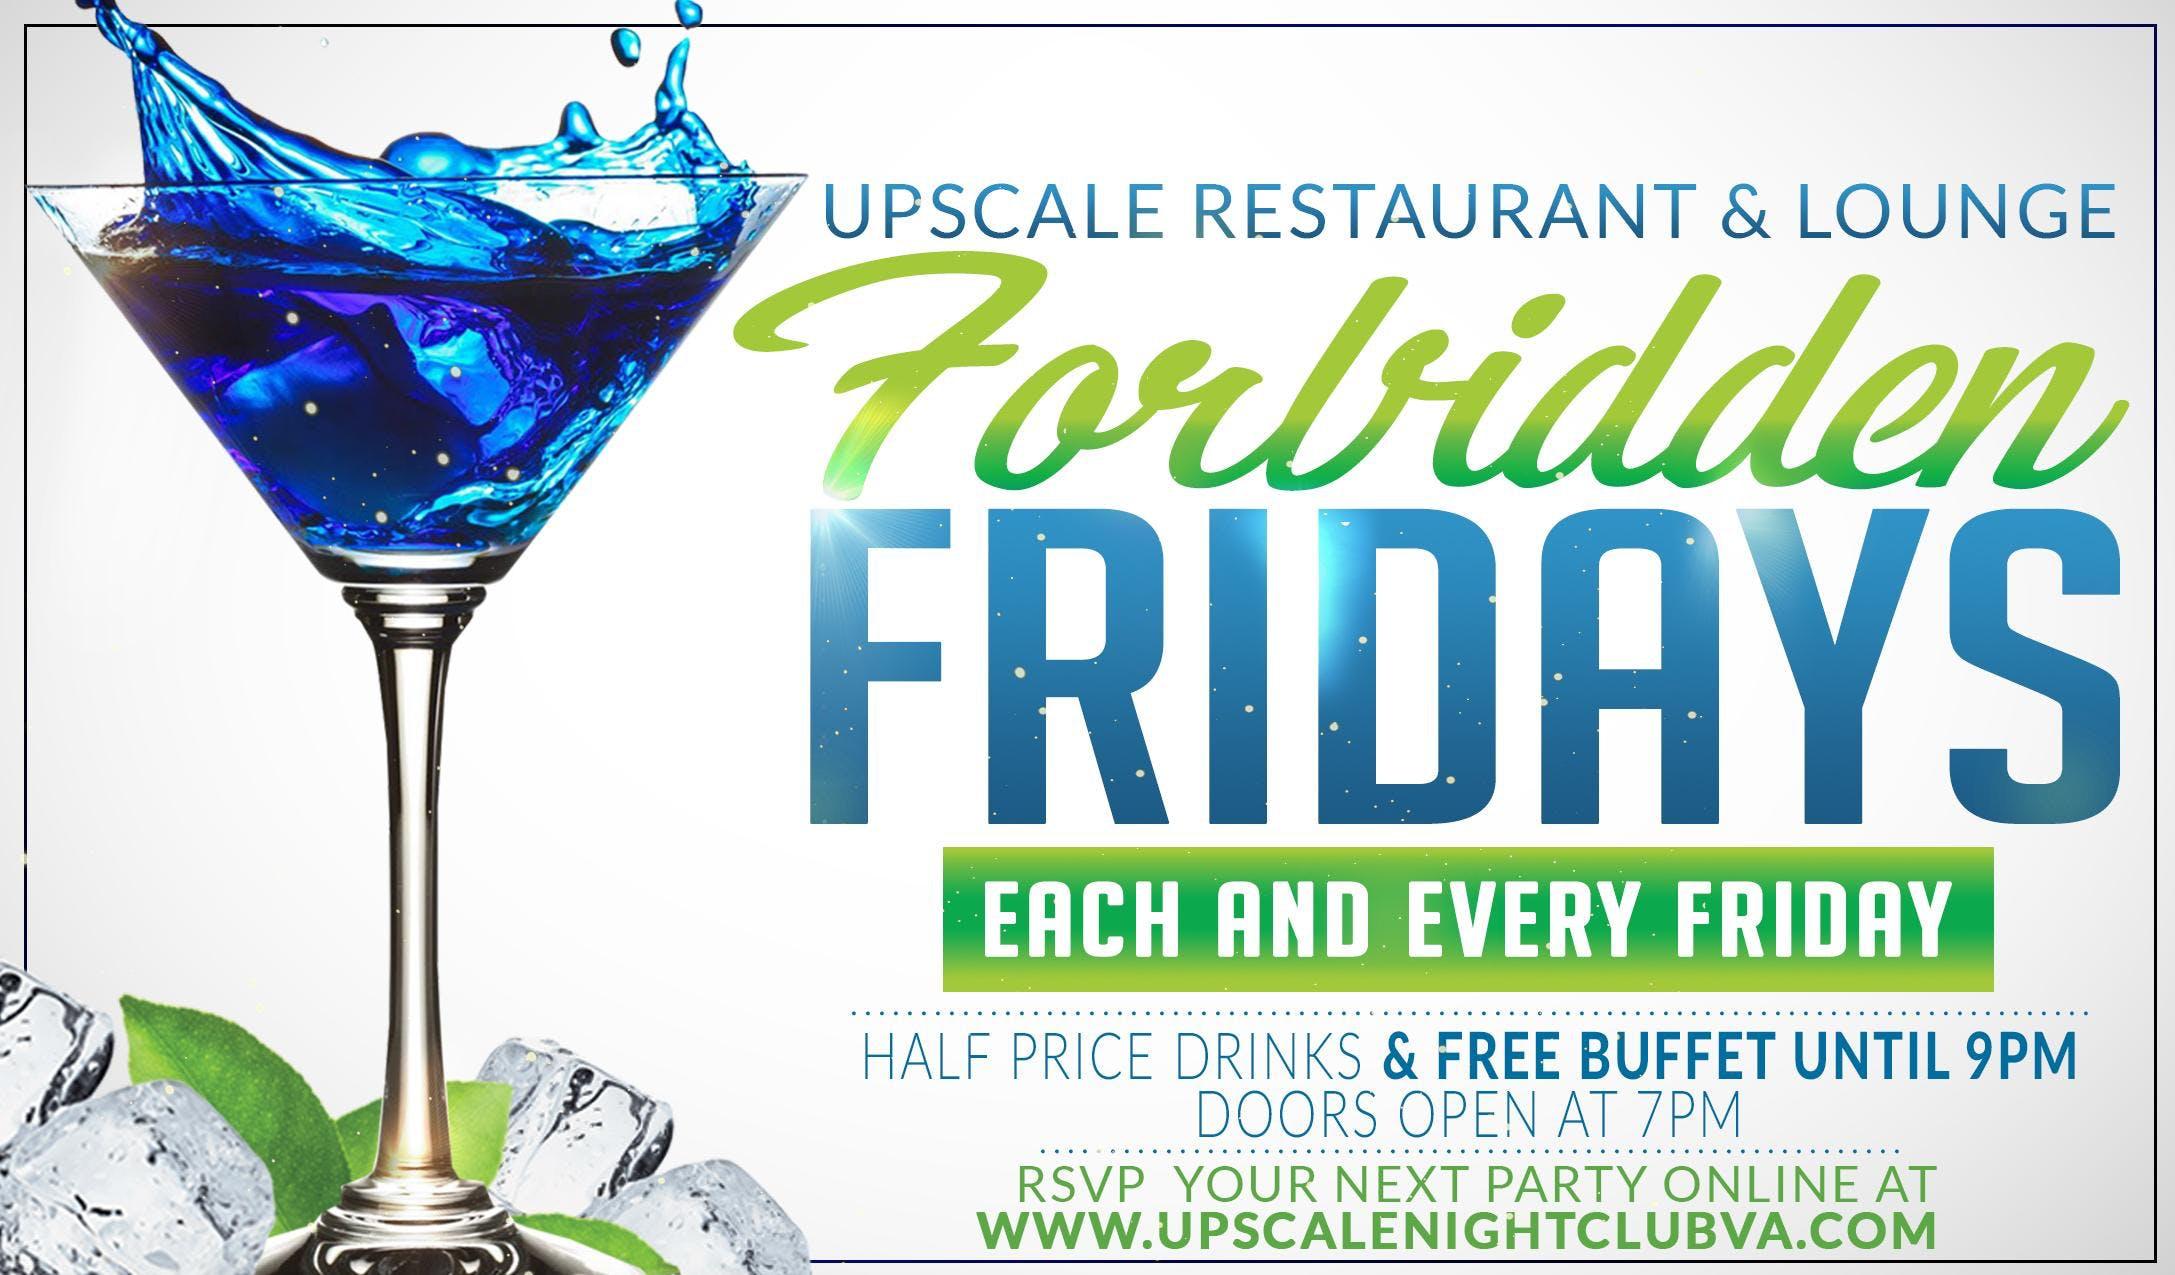 Forbidden Fridays at Upscale Restaurant & Lounge, Virginia Beach